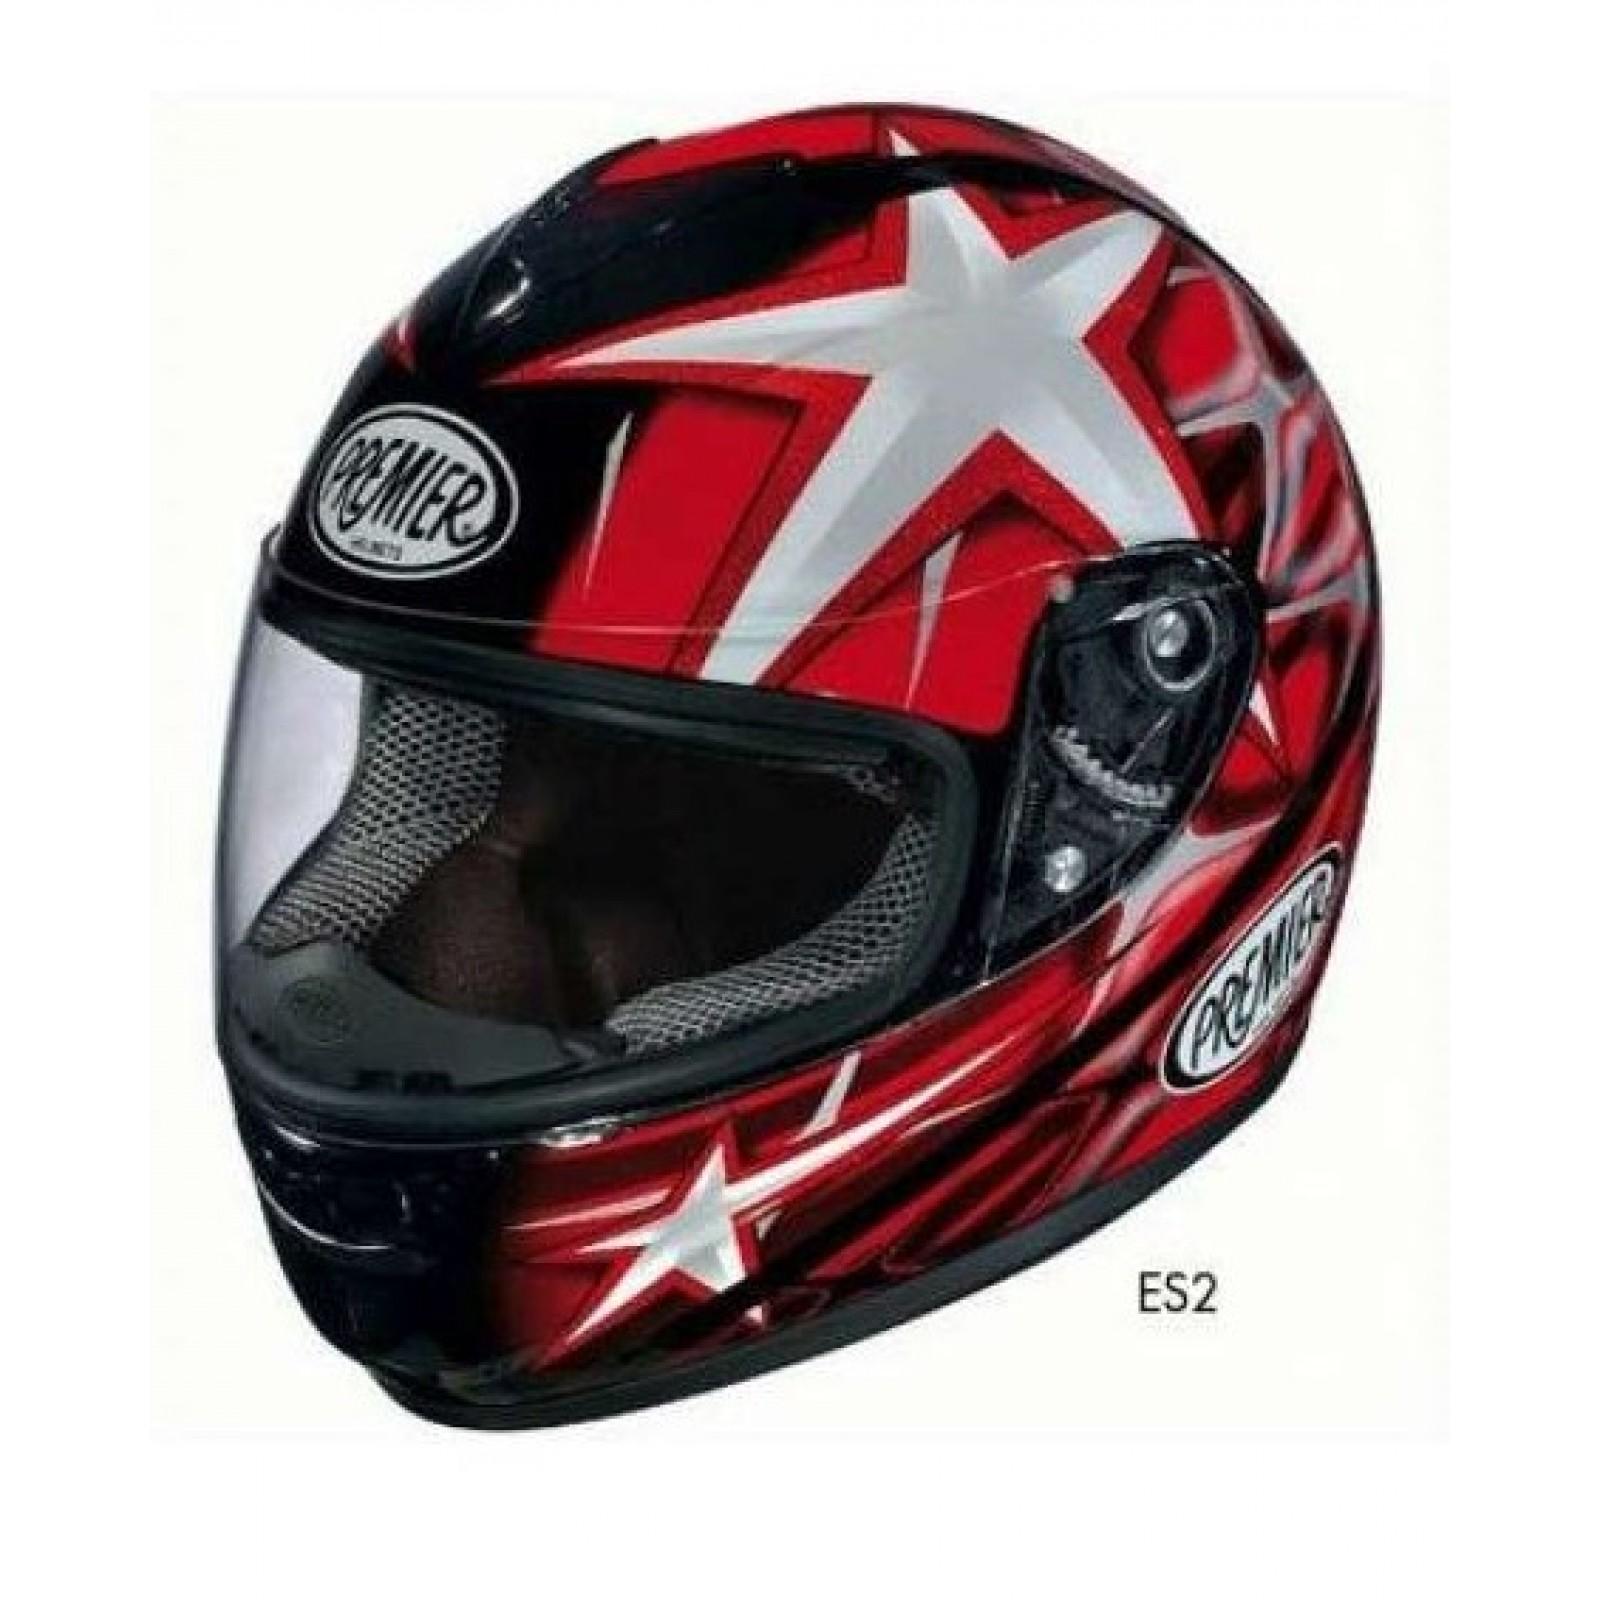 МОТОШЛЕМ PREMIER MONZA 2011 RED  Артмото - купить квадроцикл в украине и харькове, мотоцикл, снегоход, скутер, мопед, электромобиль